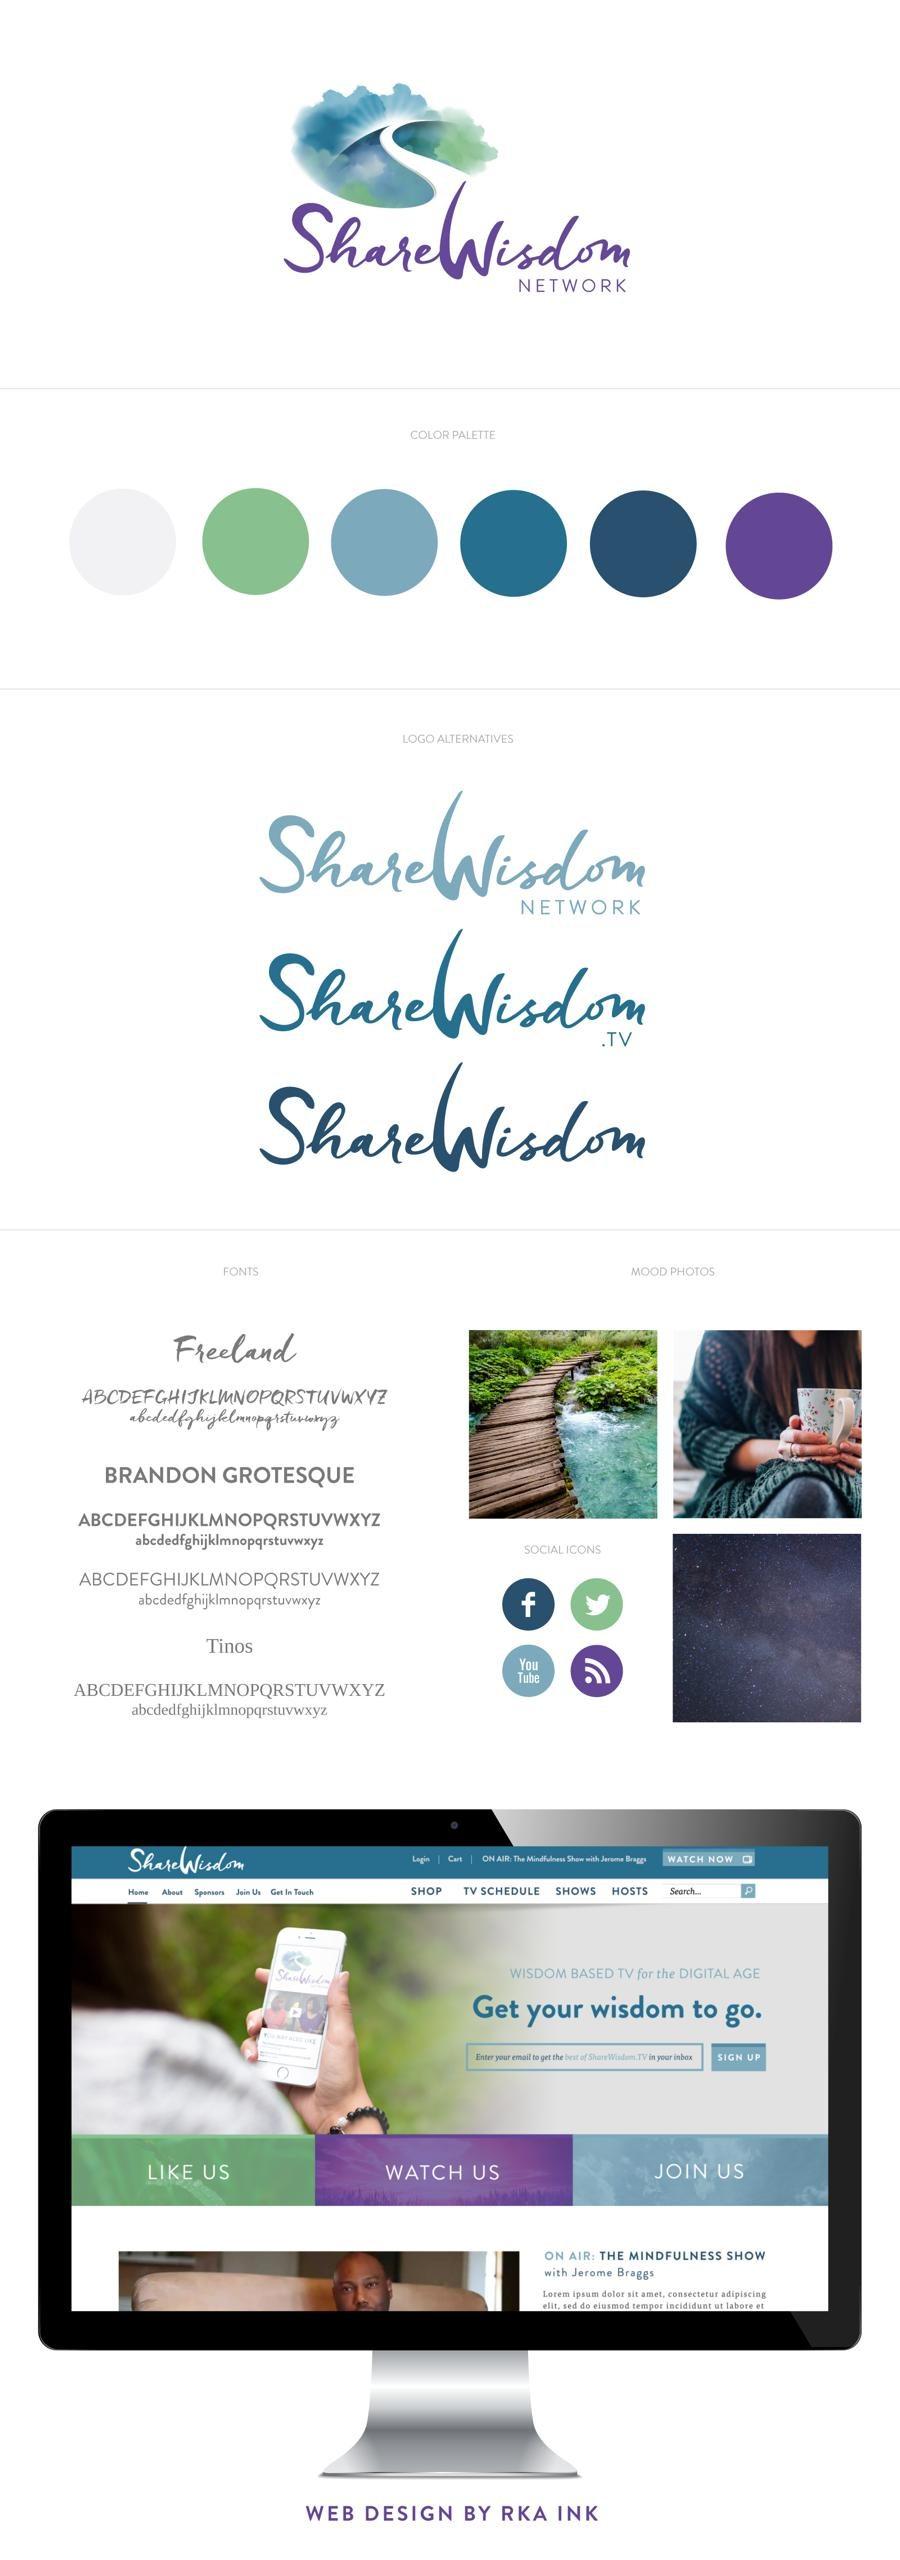 Share Wisdom Identity Design RKA ink